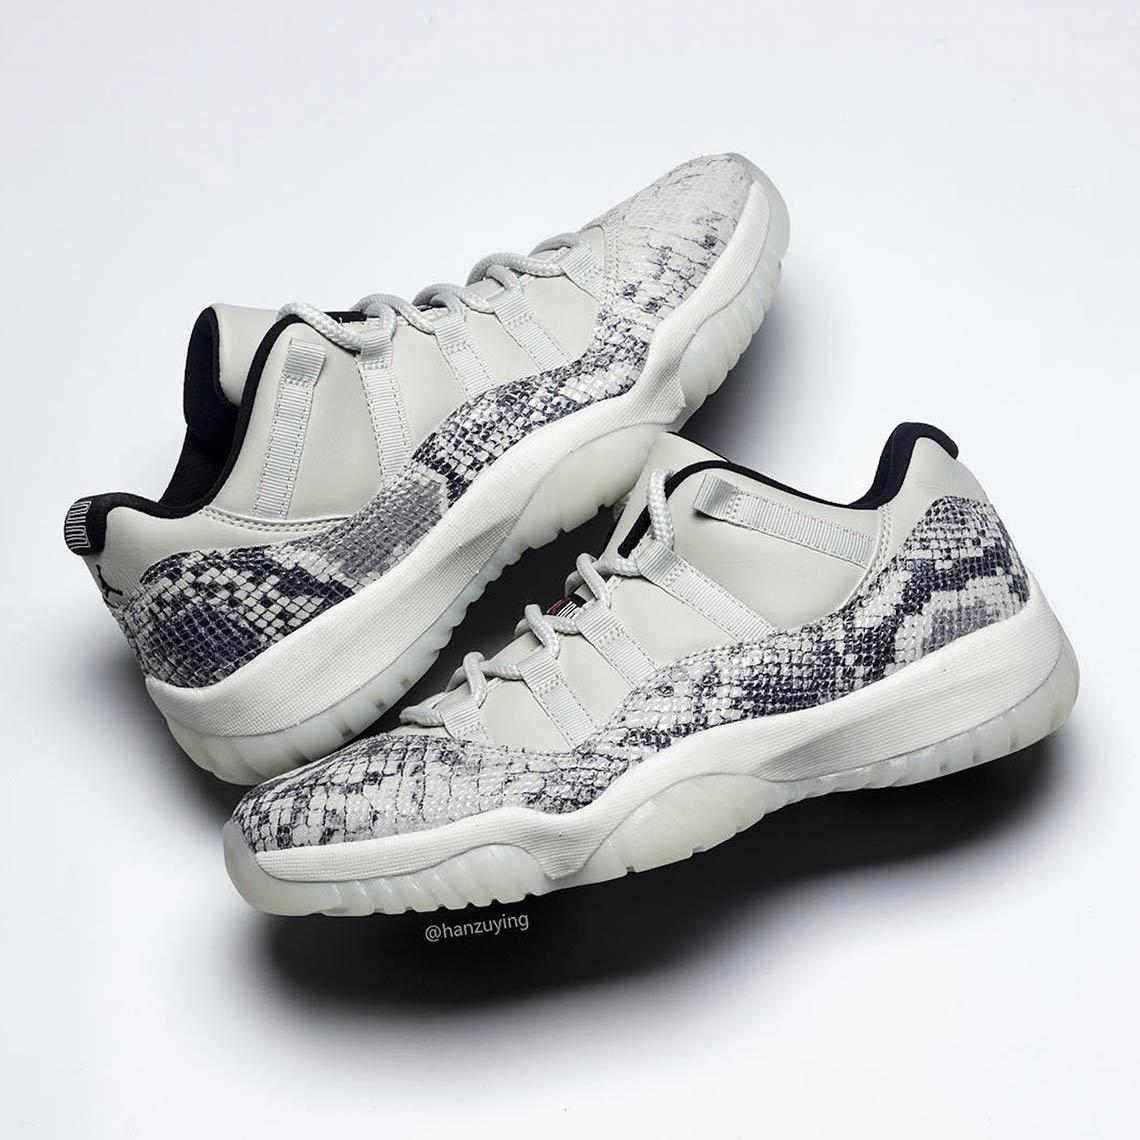 7f1ffdc953de8 Air Jordan 11 Low Snakeskin Light Bone CD6846-002 | SneakerNews.com